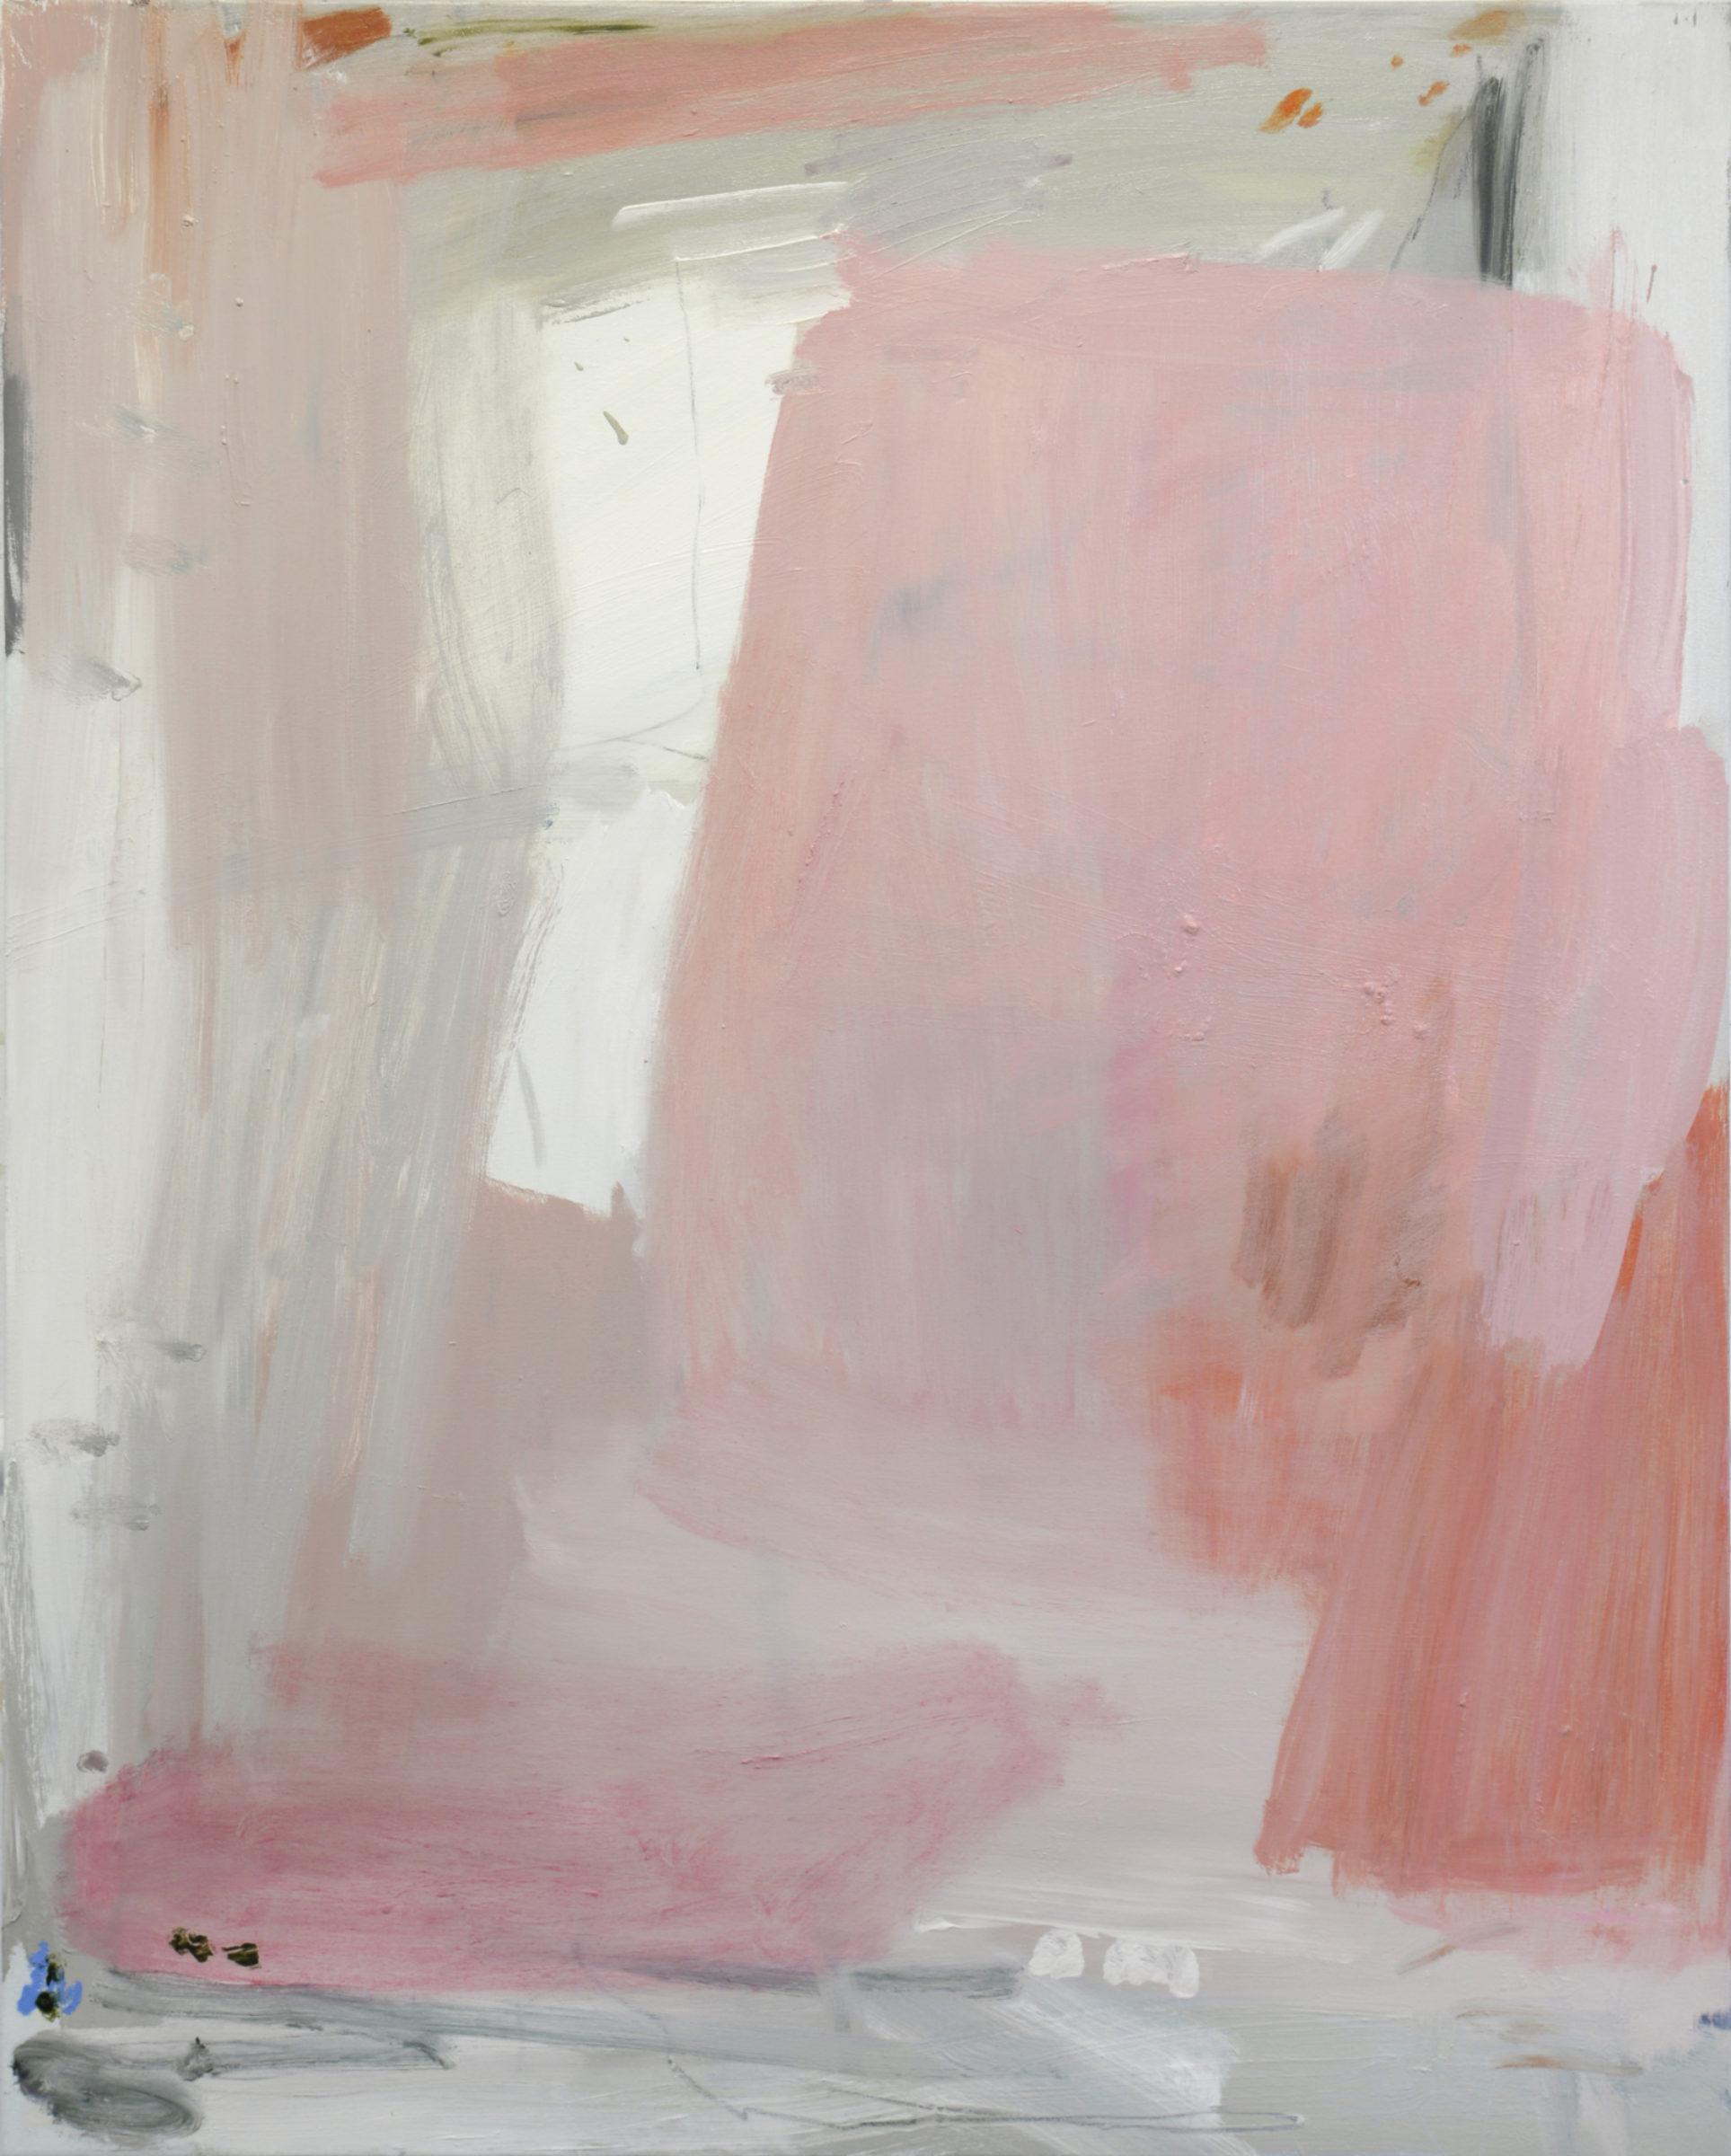 BG_ECG_Blush_2018_Oil-on-canvas_90x72cm_2200